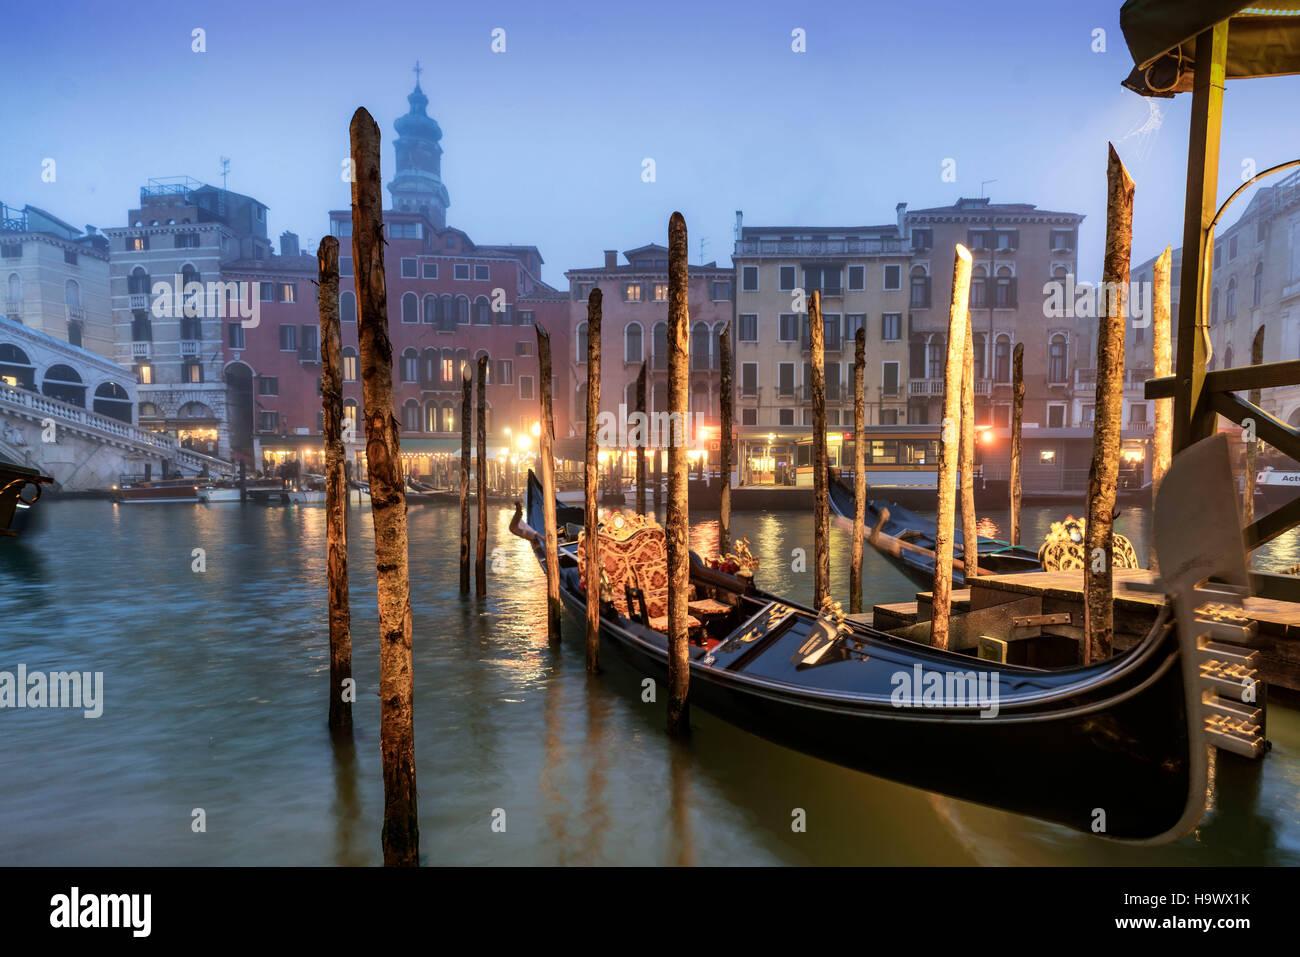 Gondola near Rialto bridge , Canal Grande at dusk, fog, gondola,  Venedig, Venezia, Venice, Italia, Europe, - Stock Image